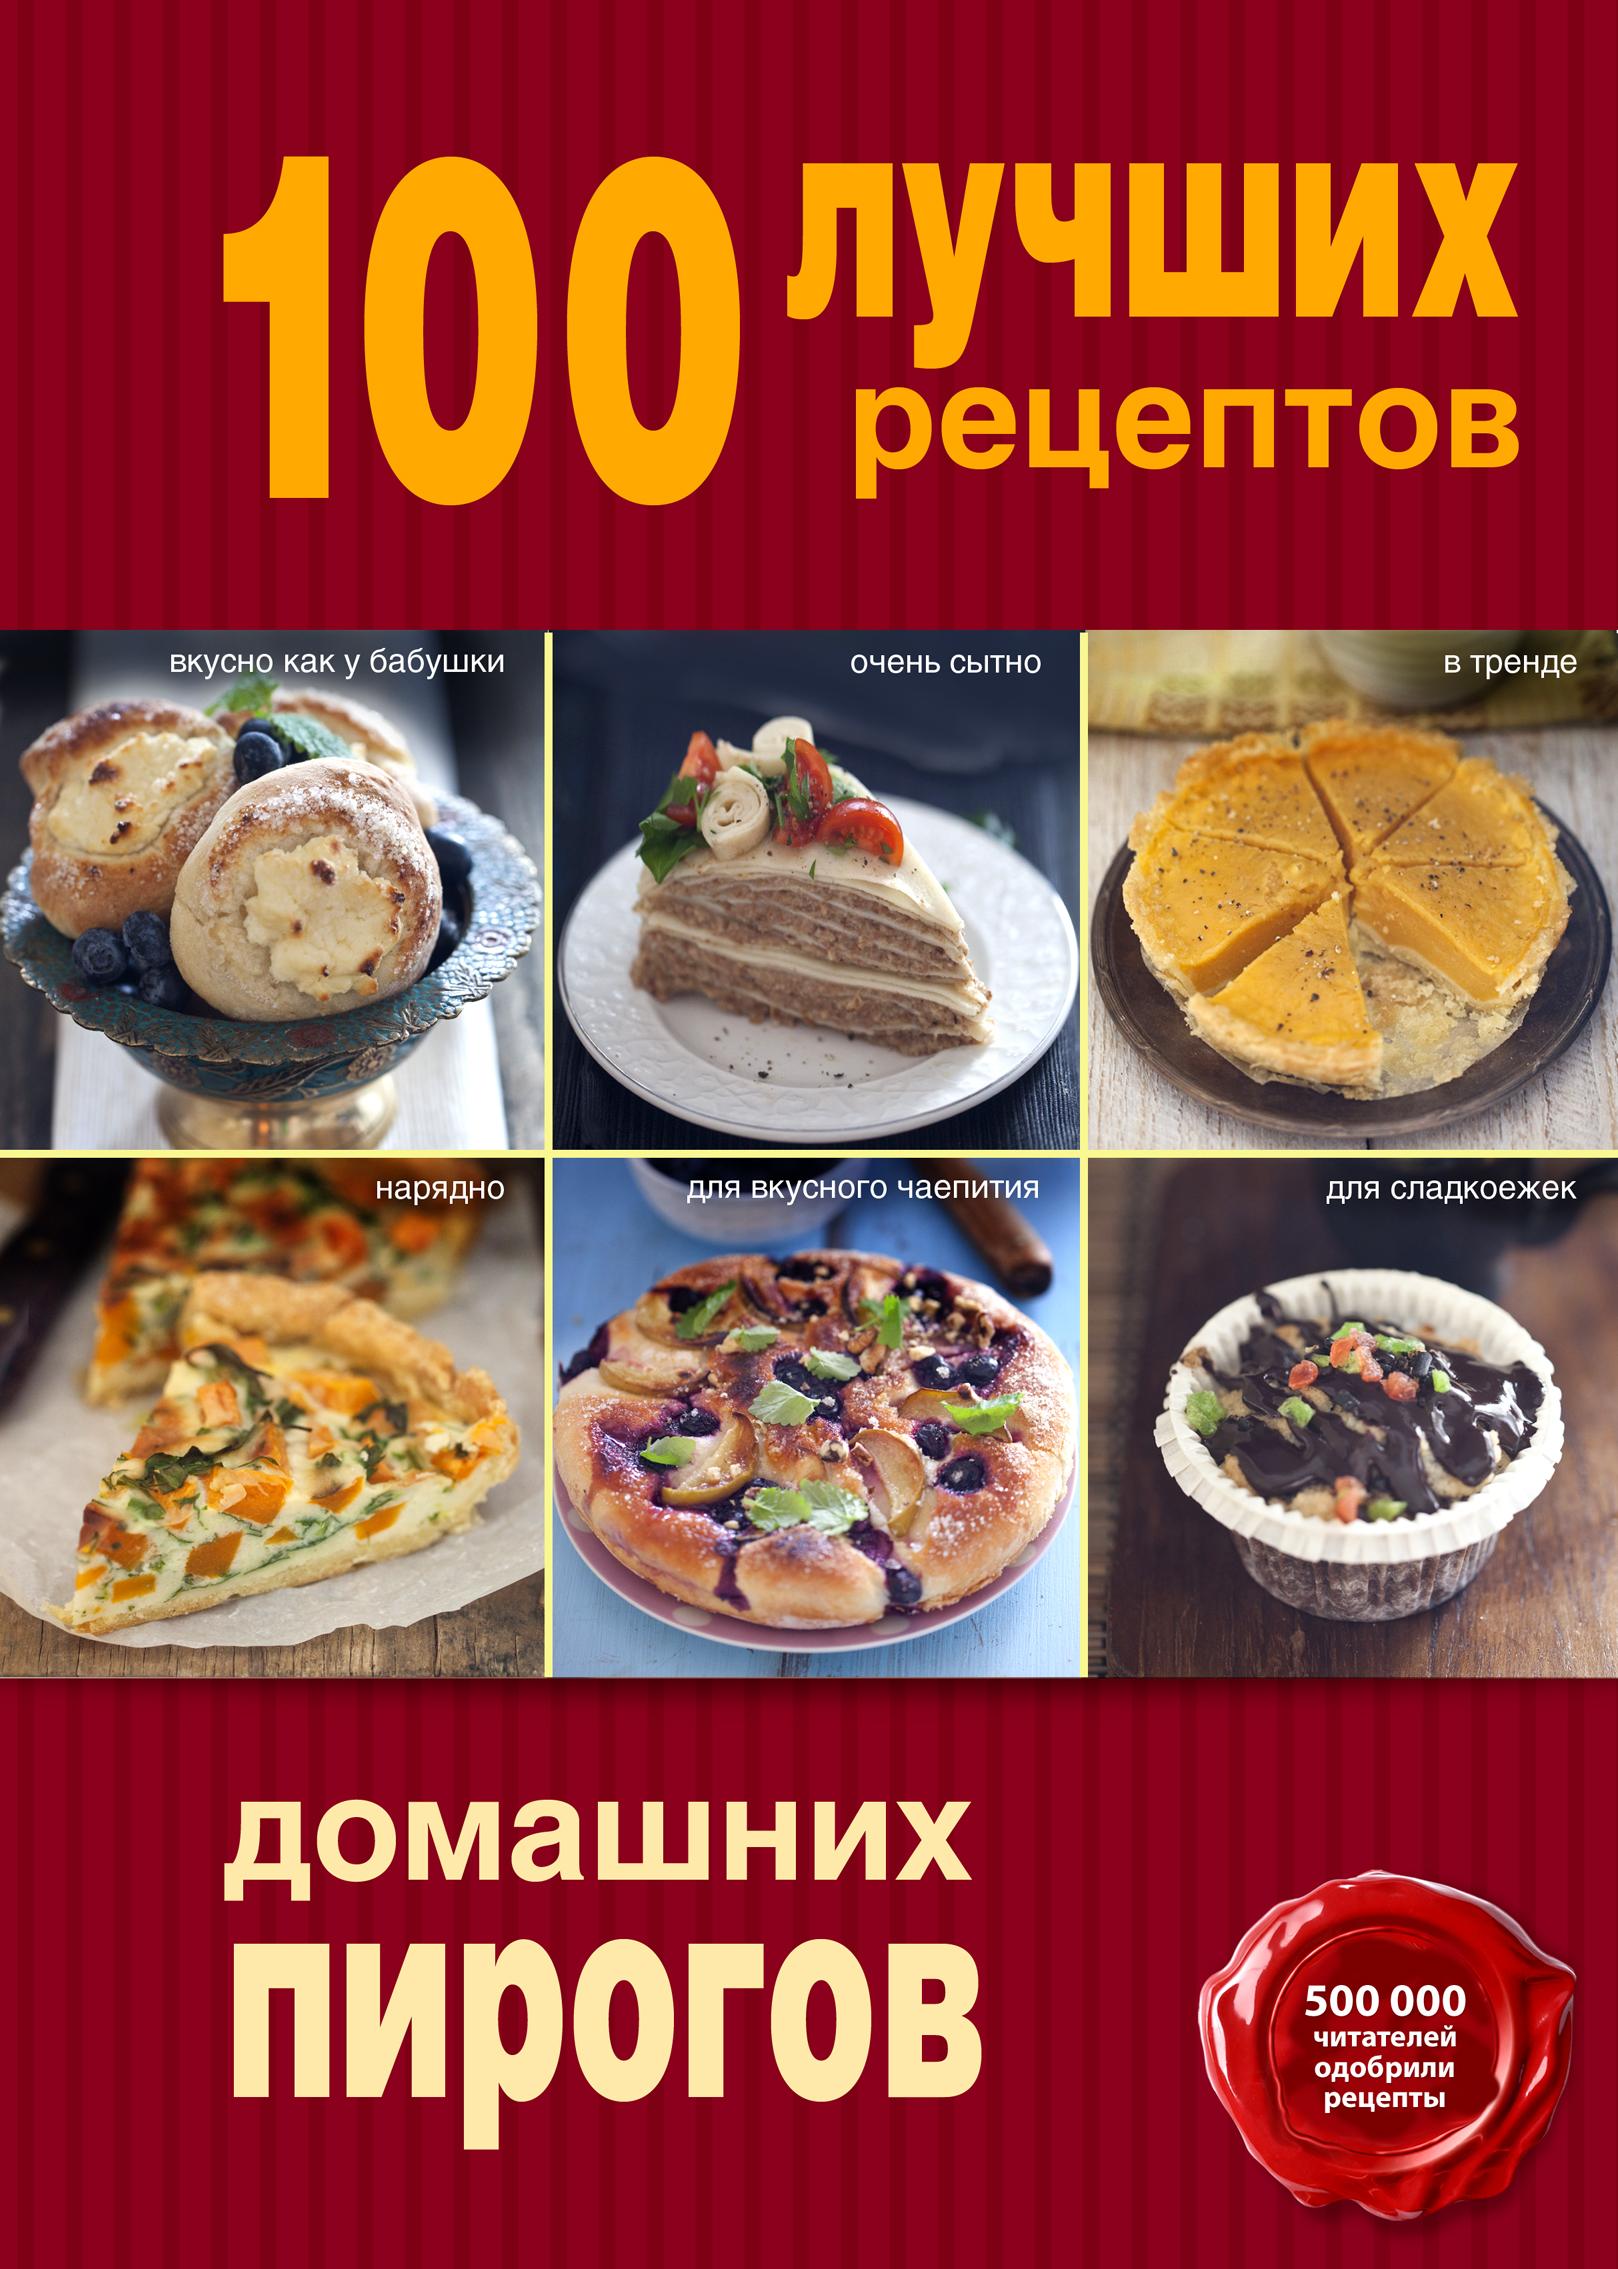 100 ������ �������� �������� �������